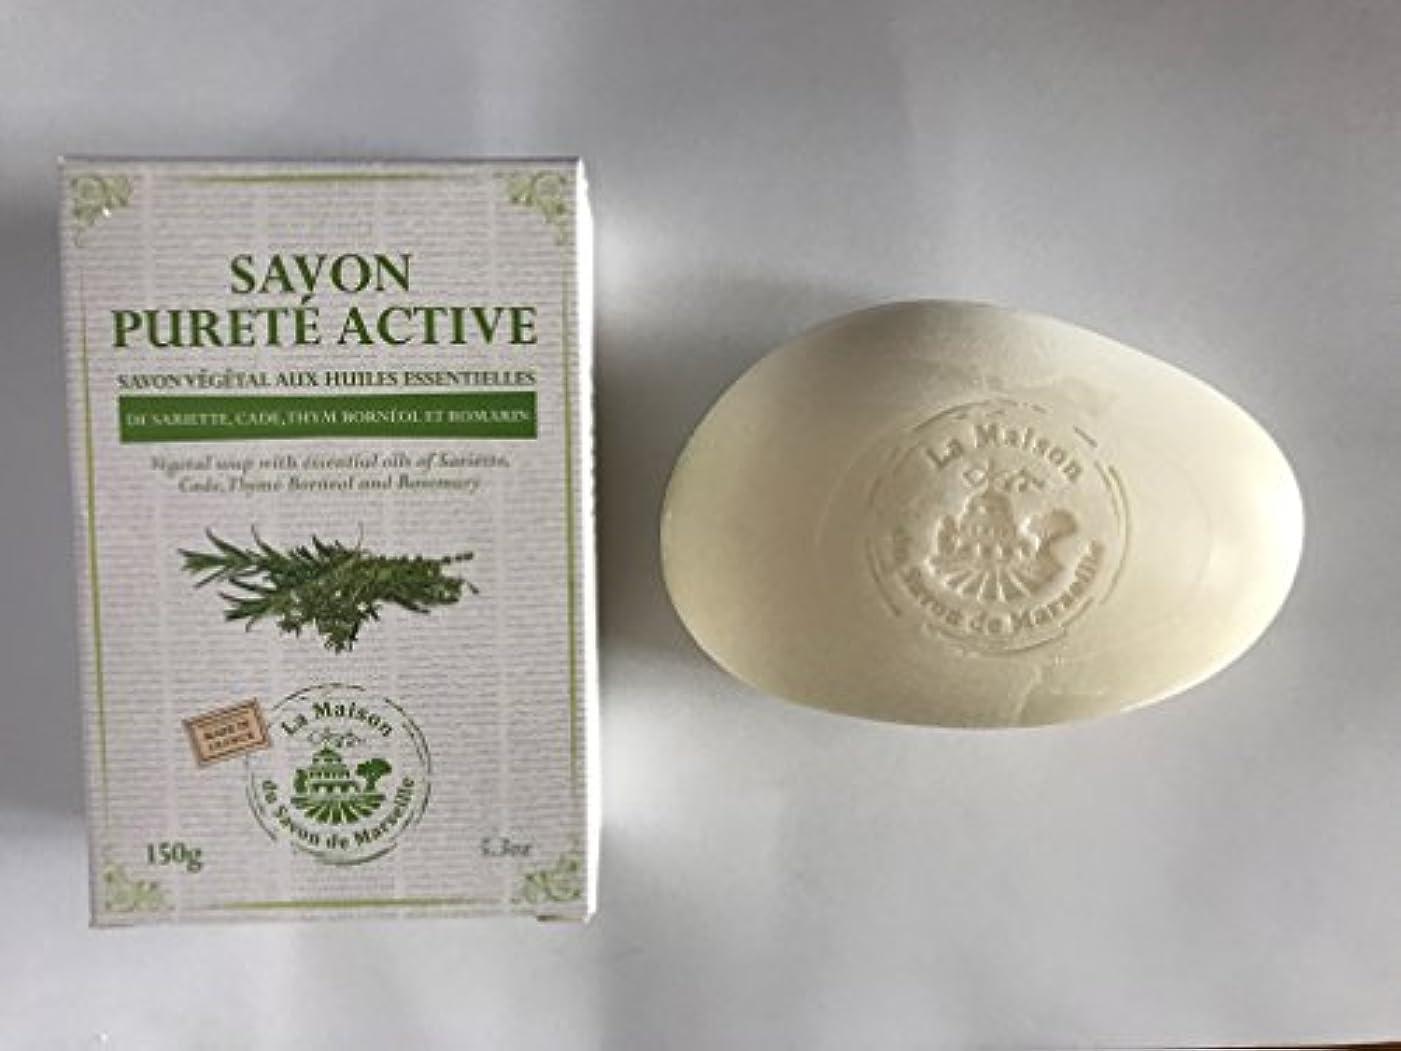 Savon de Marseille Soap with essential oils,Purete active 150g